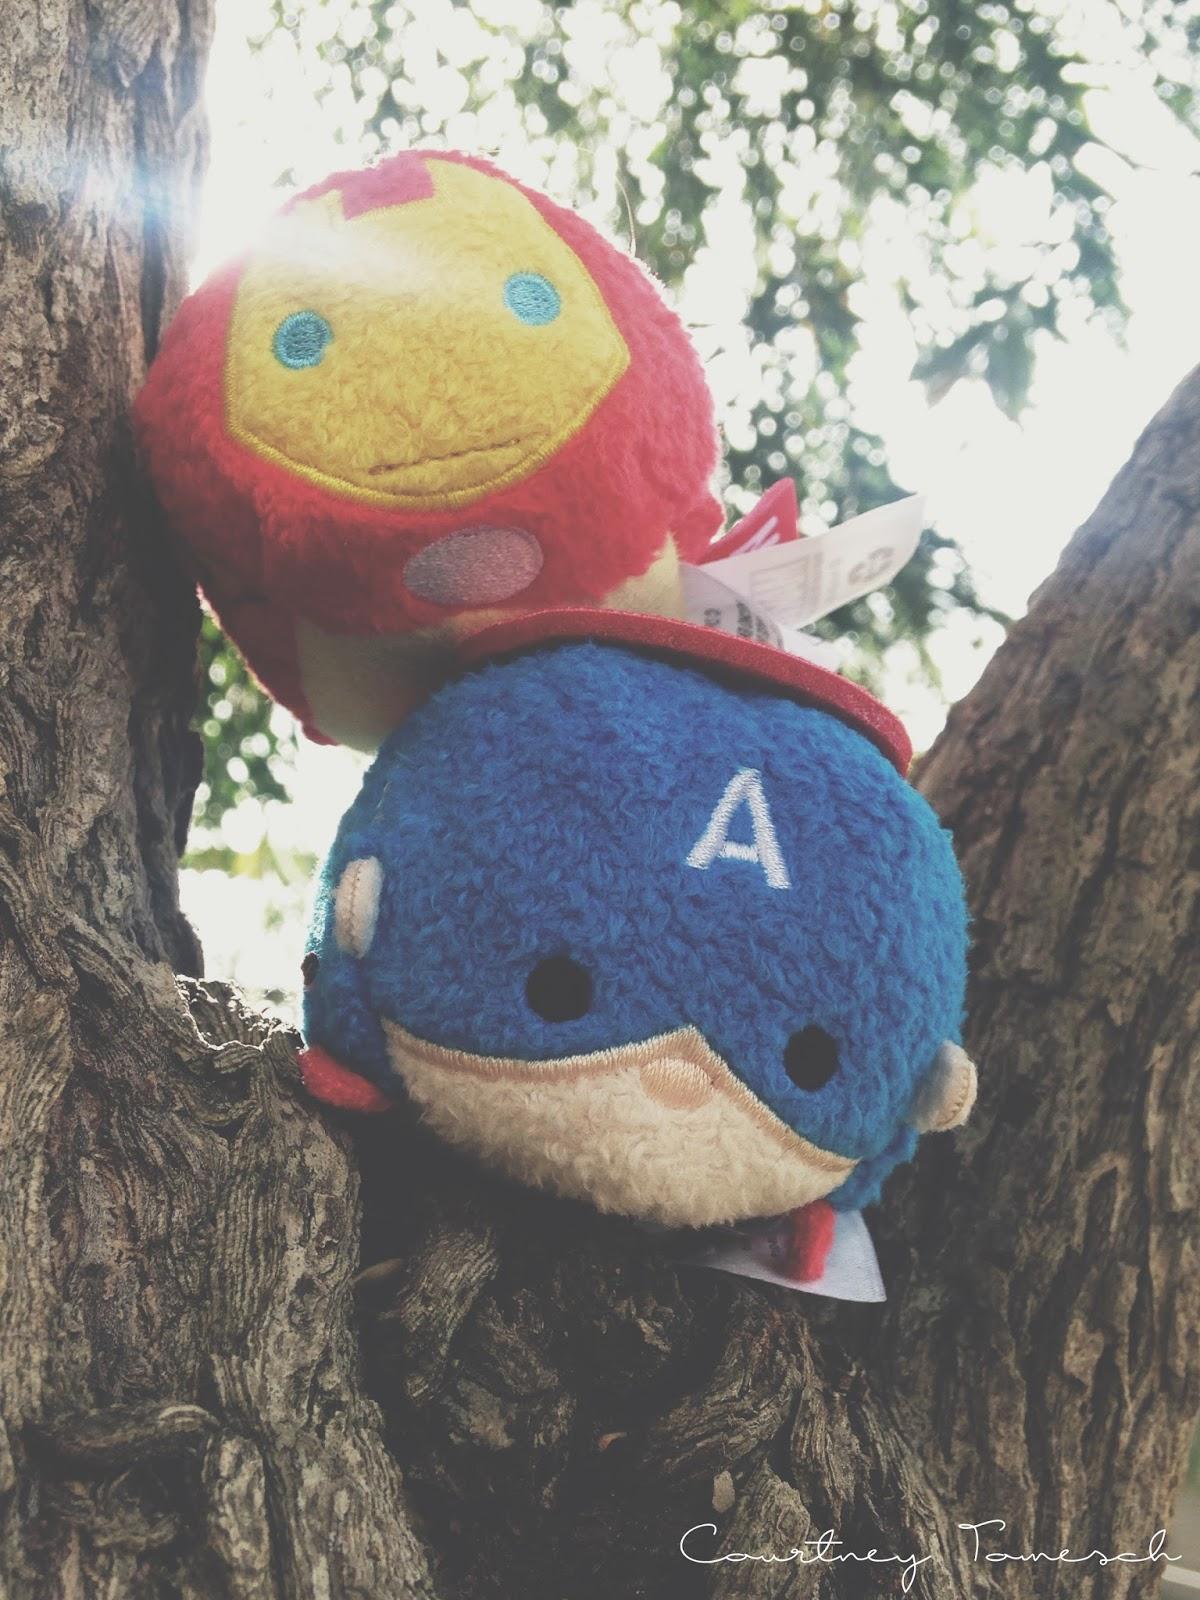 Courtney Tomesch Captain America Iron Man Tsum Tsum